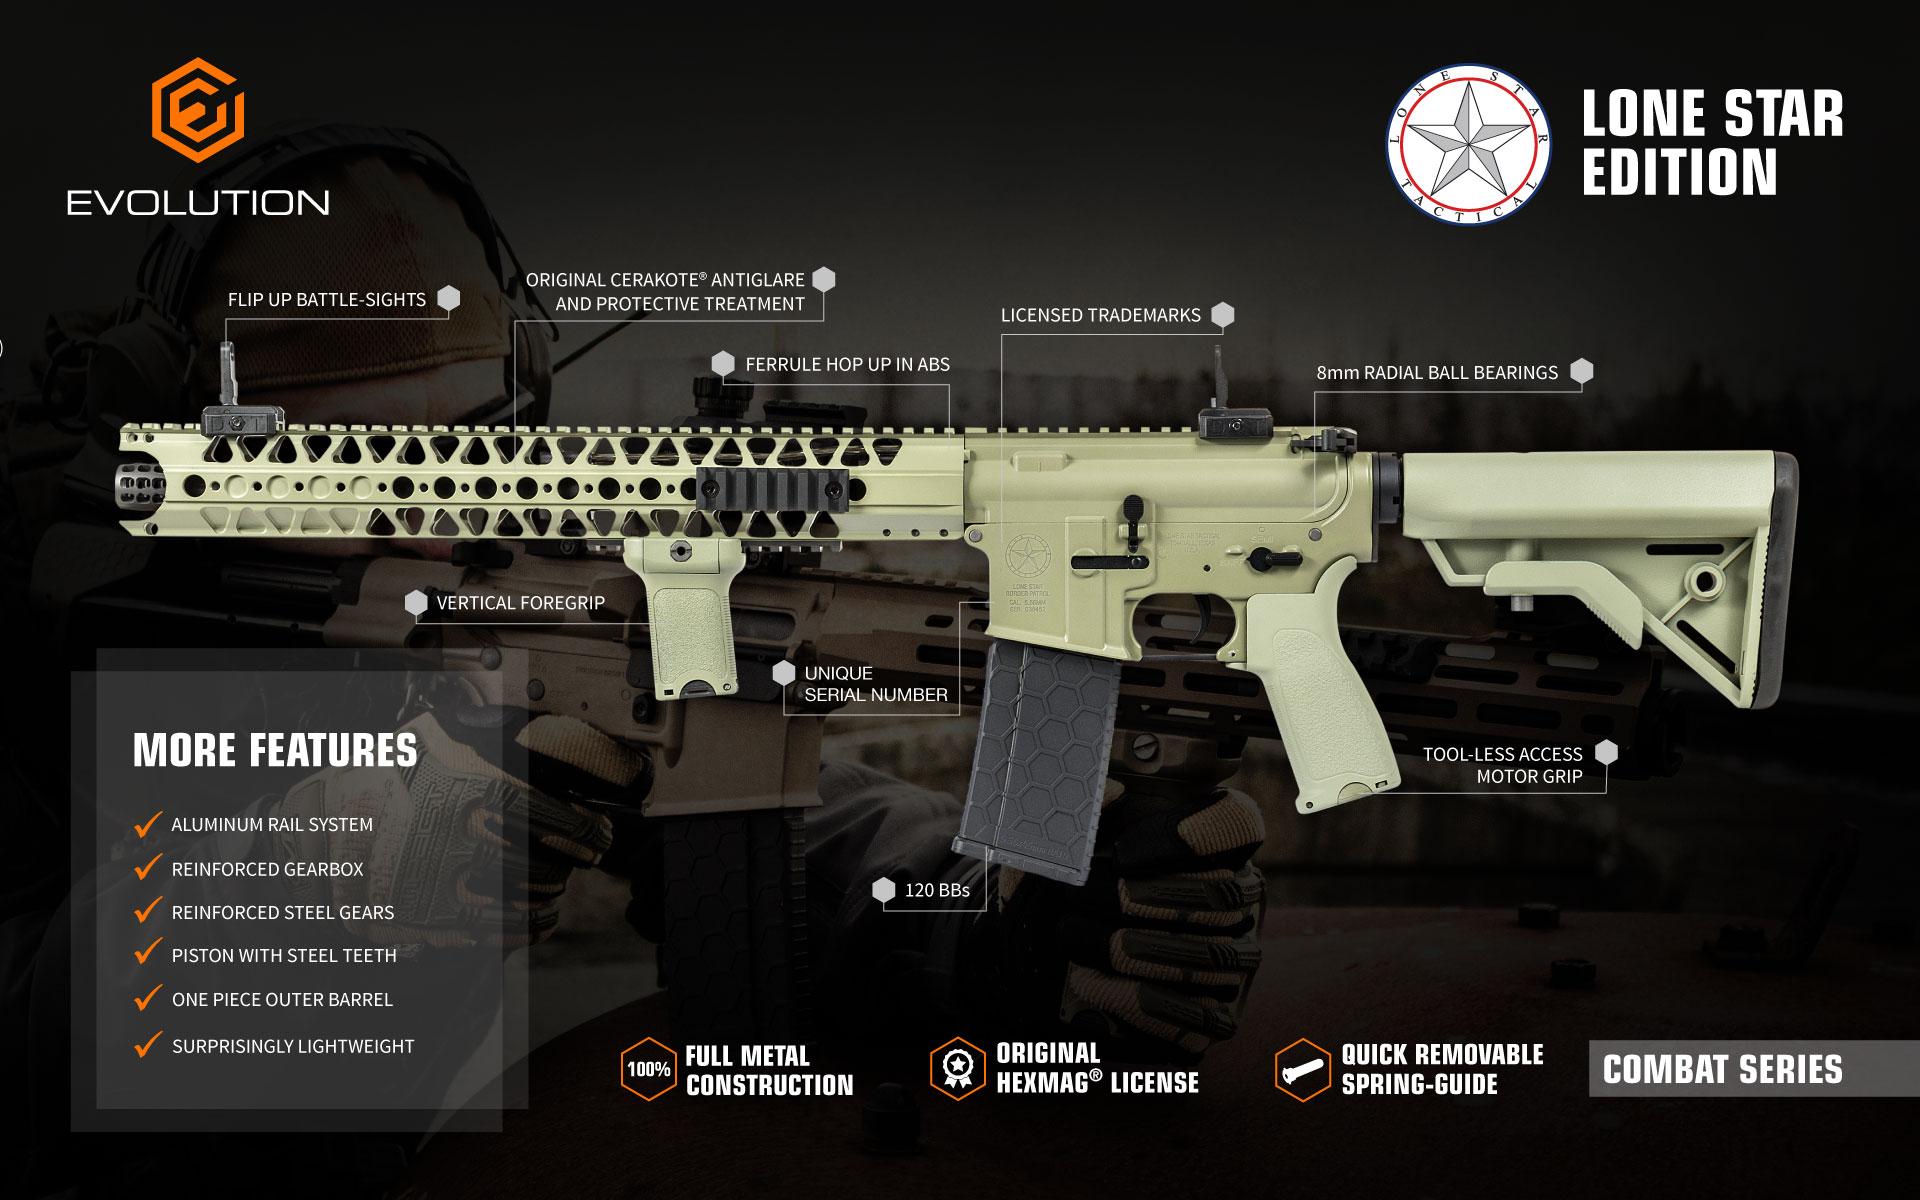 the evolution combat series air soft gun